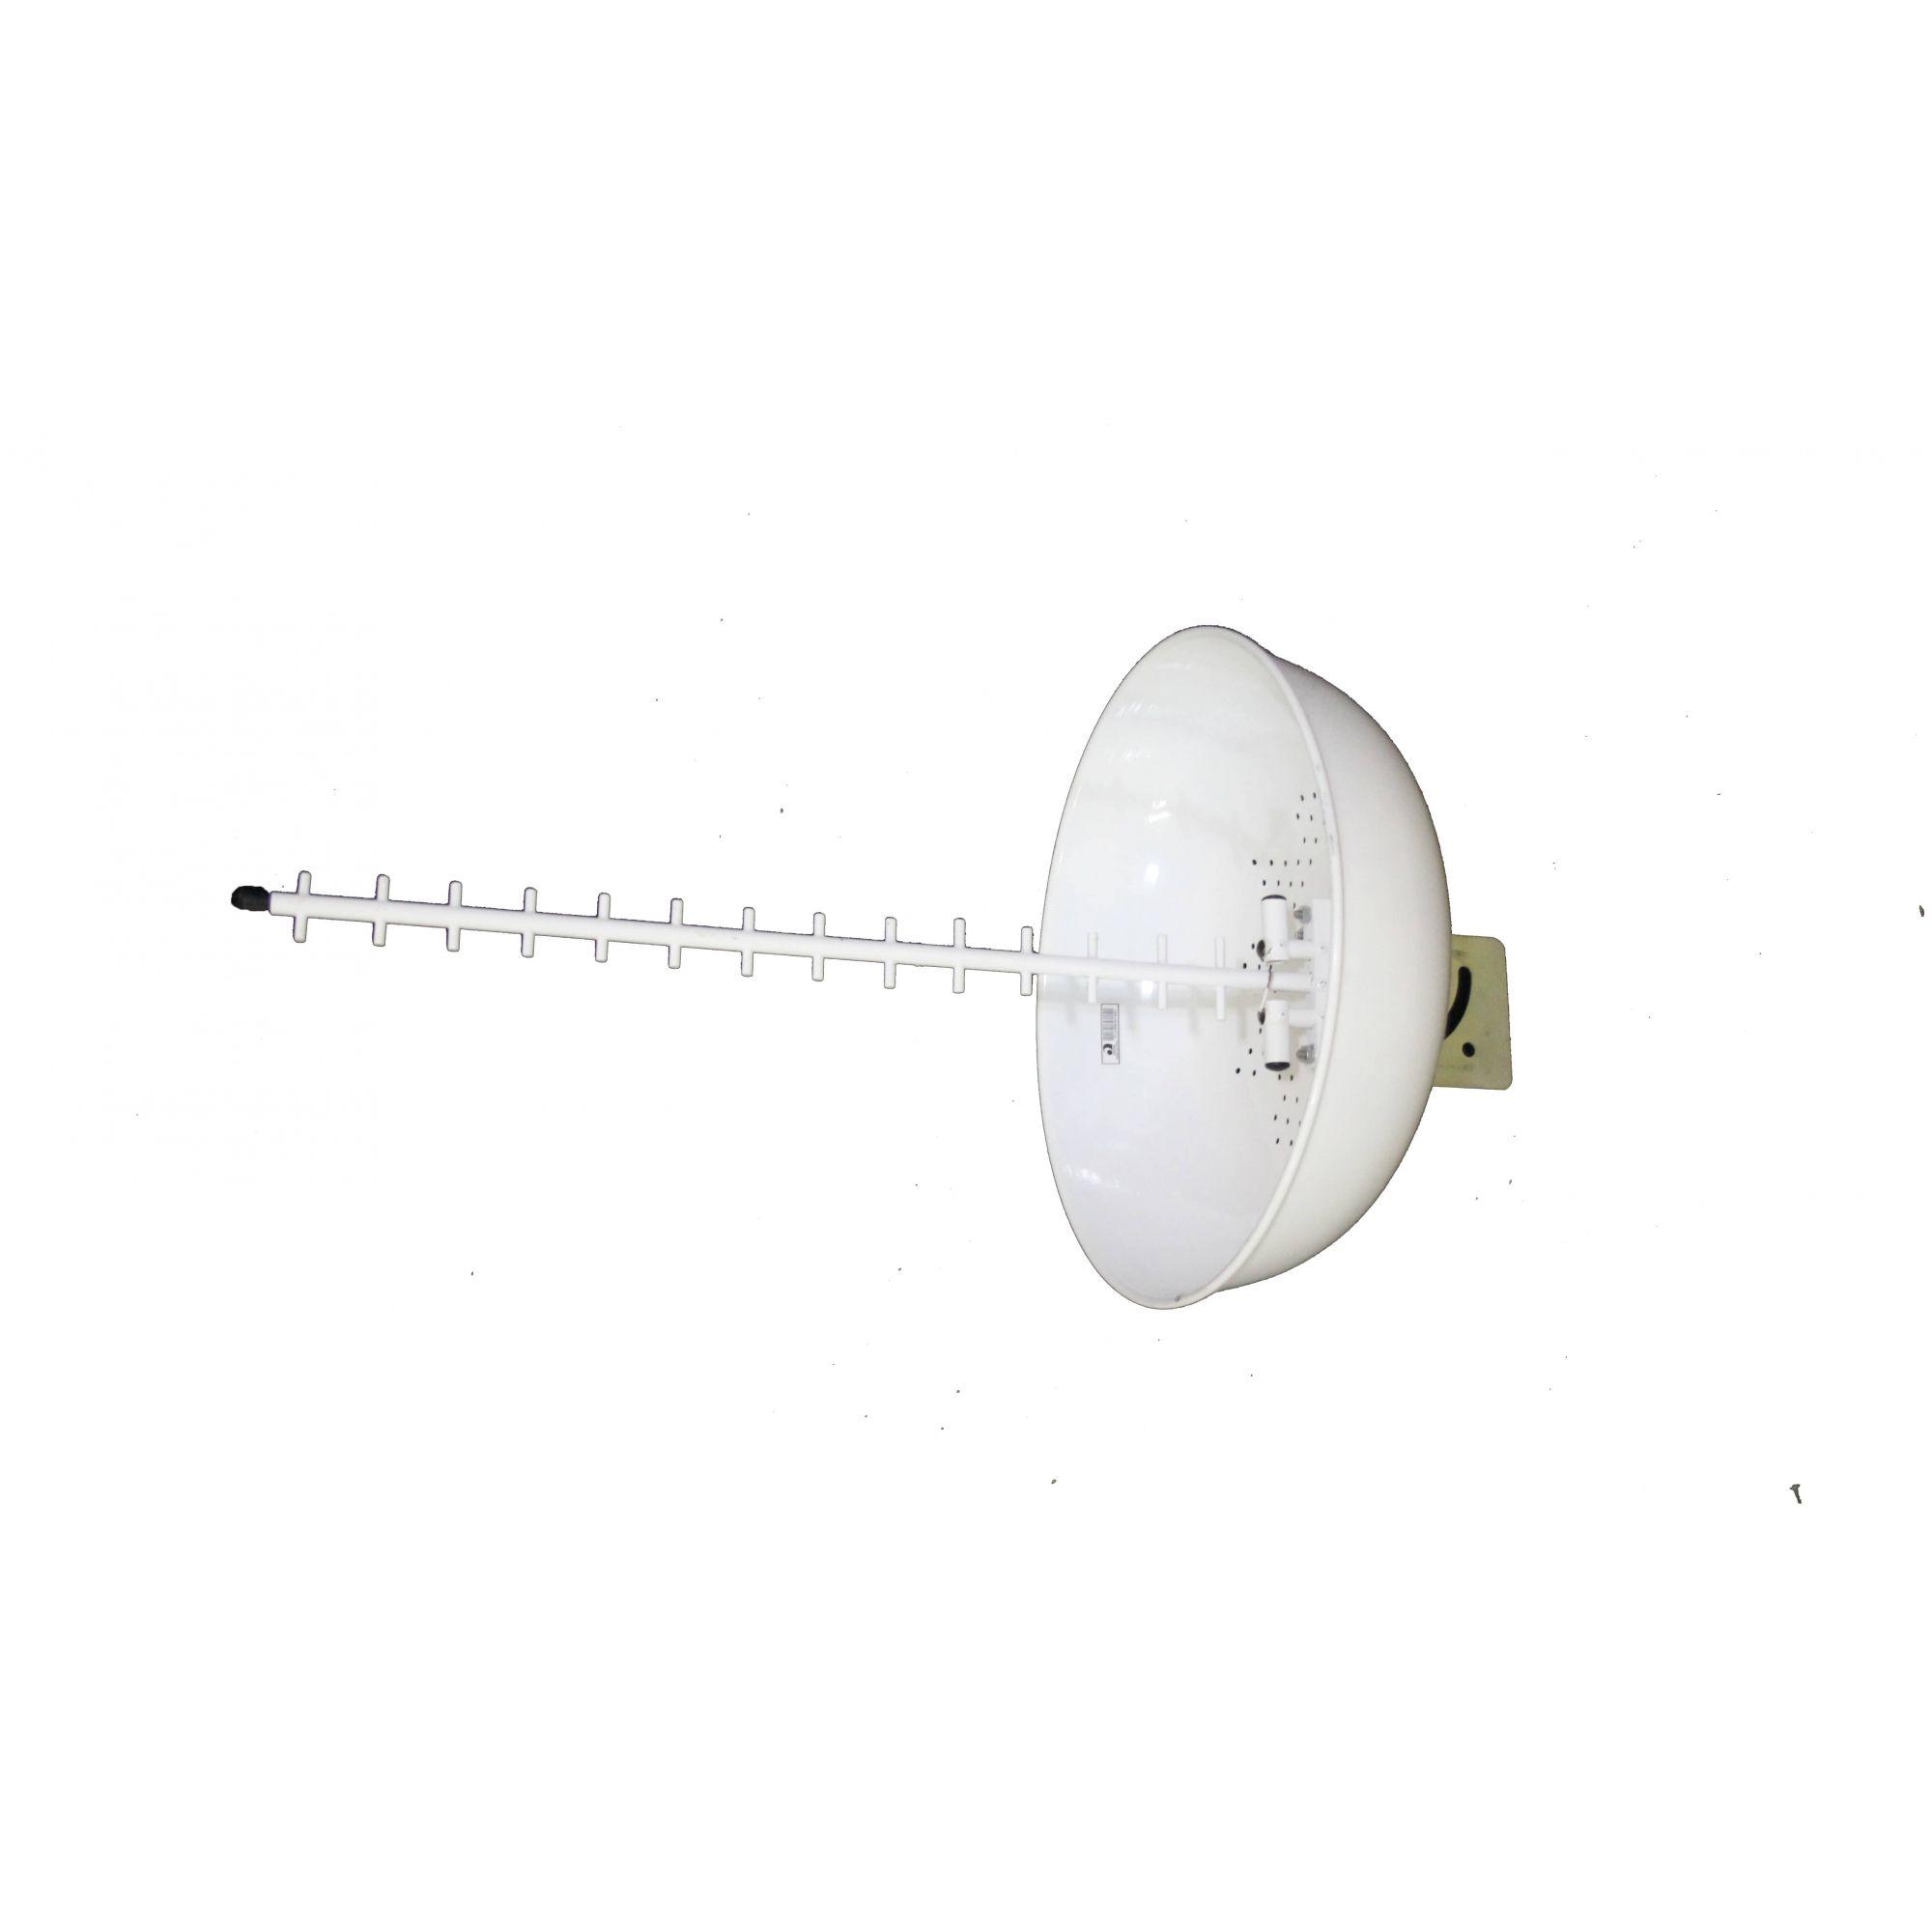 KIT ANTENA CÚBICA 4G - 24 Dbi  1900/2600 MHz